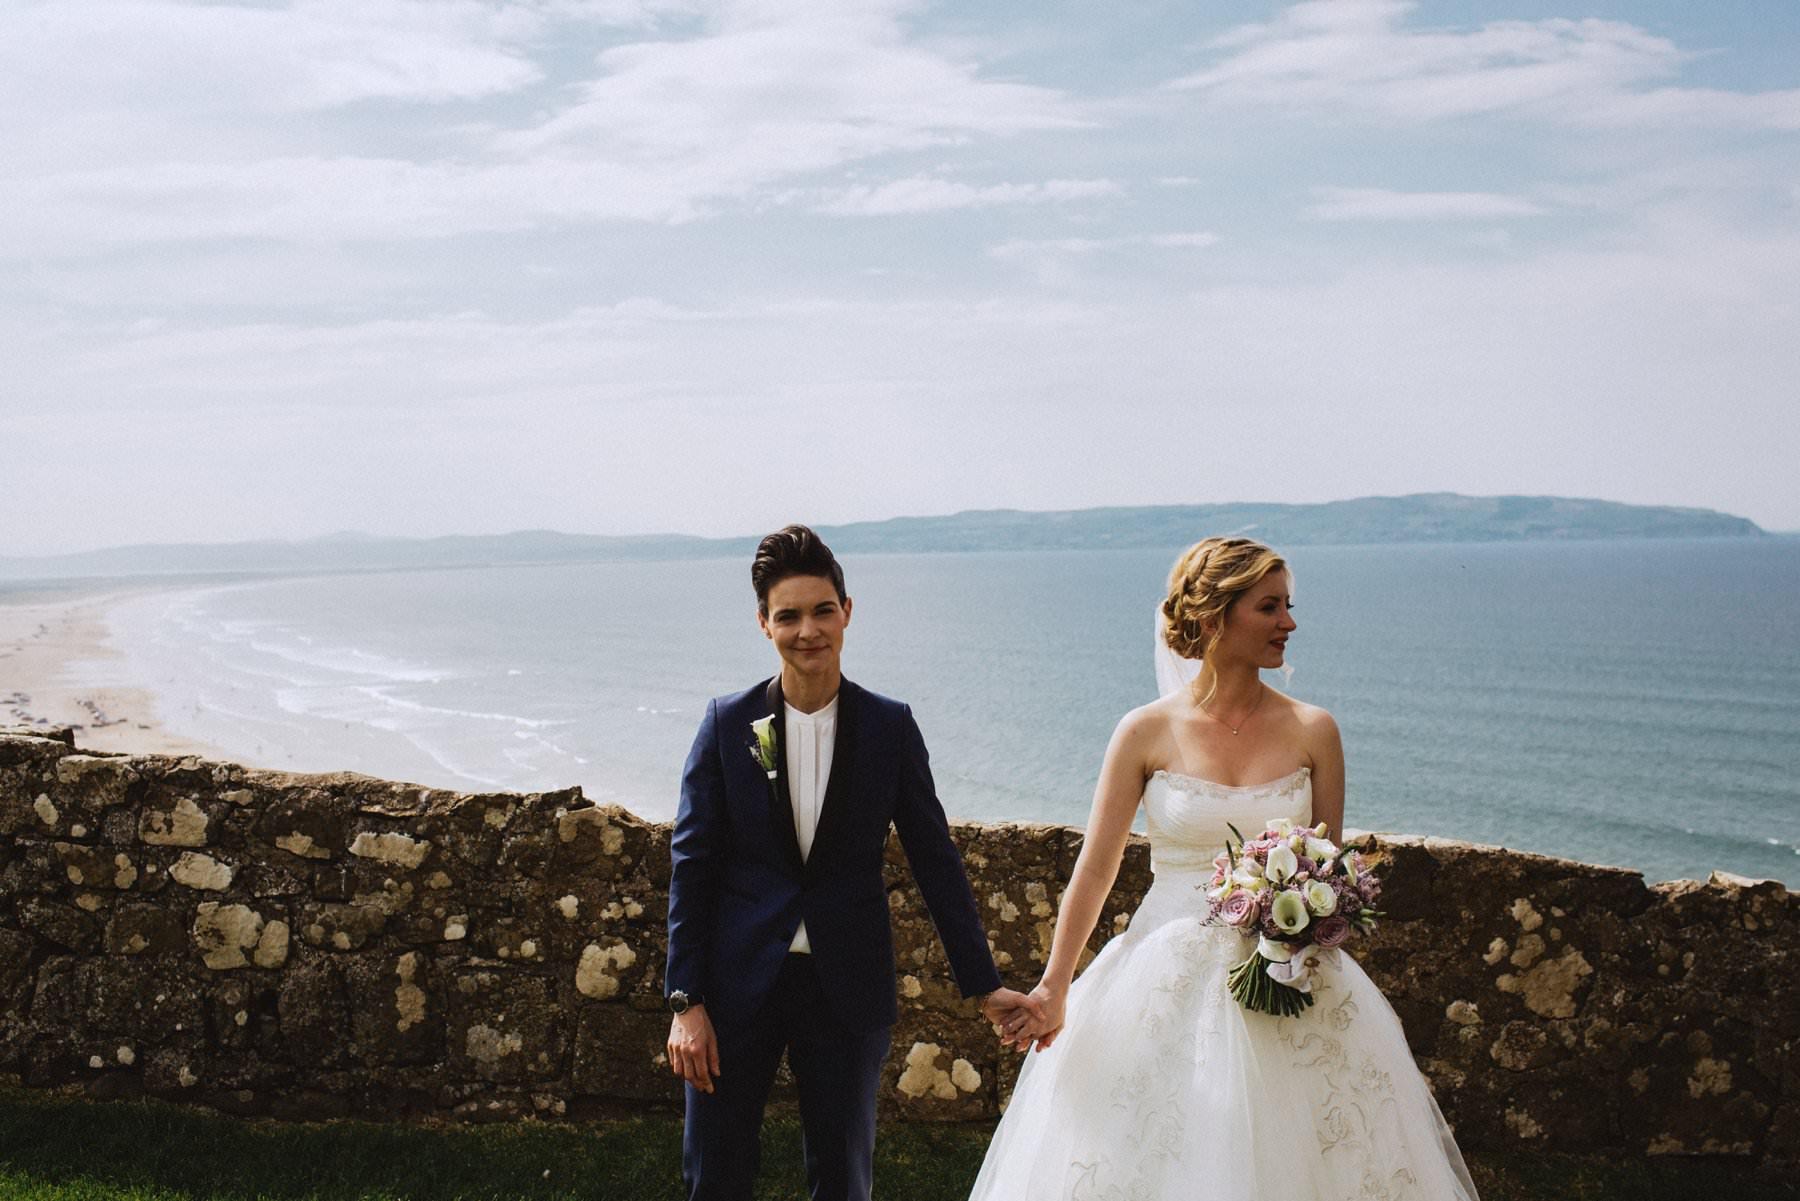 butch femme wedding photography ireland